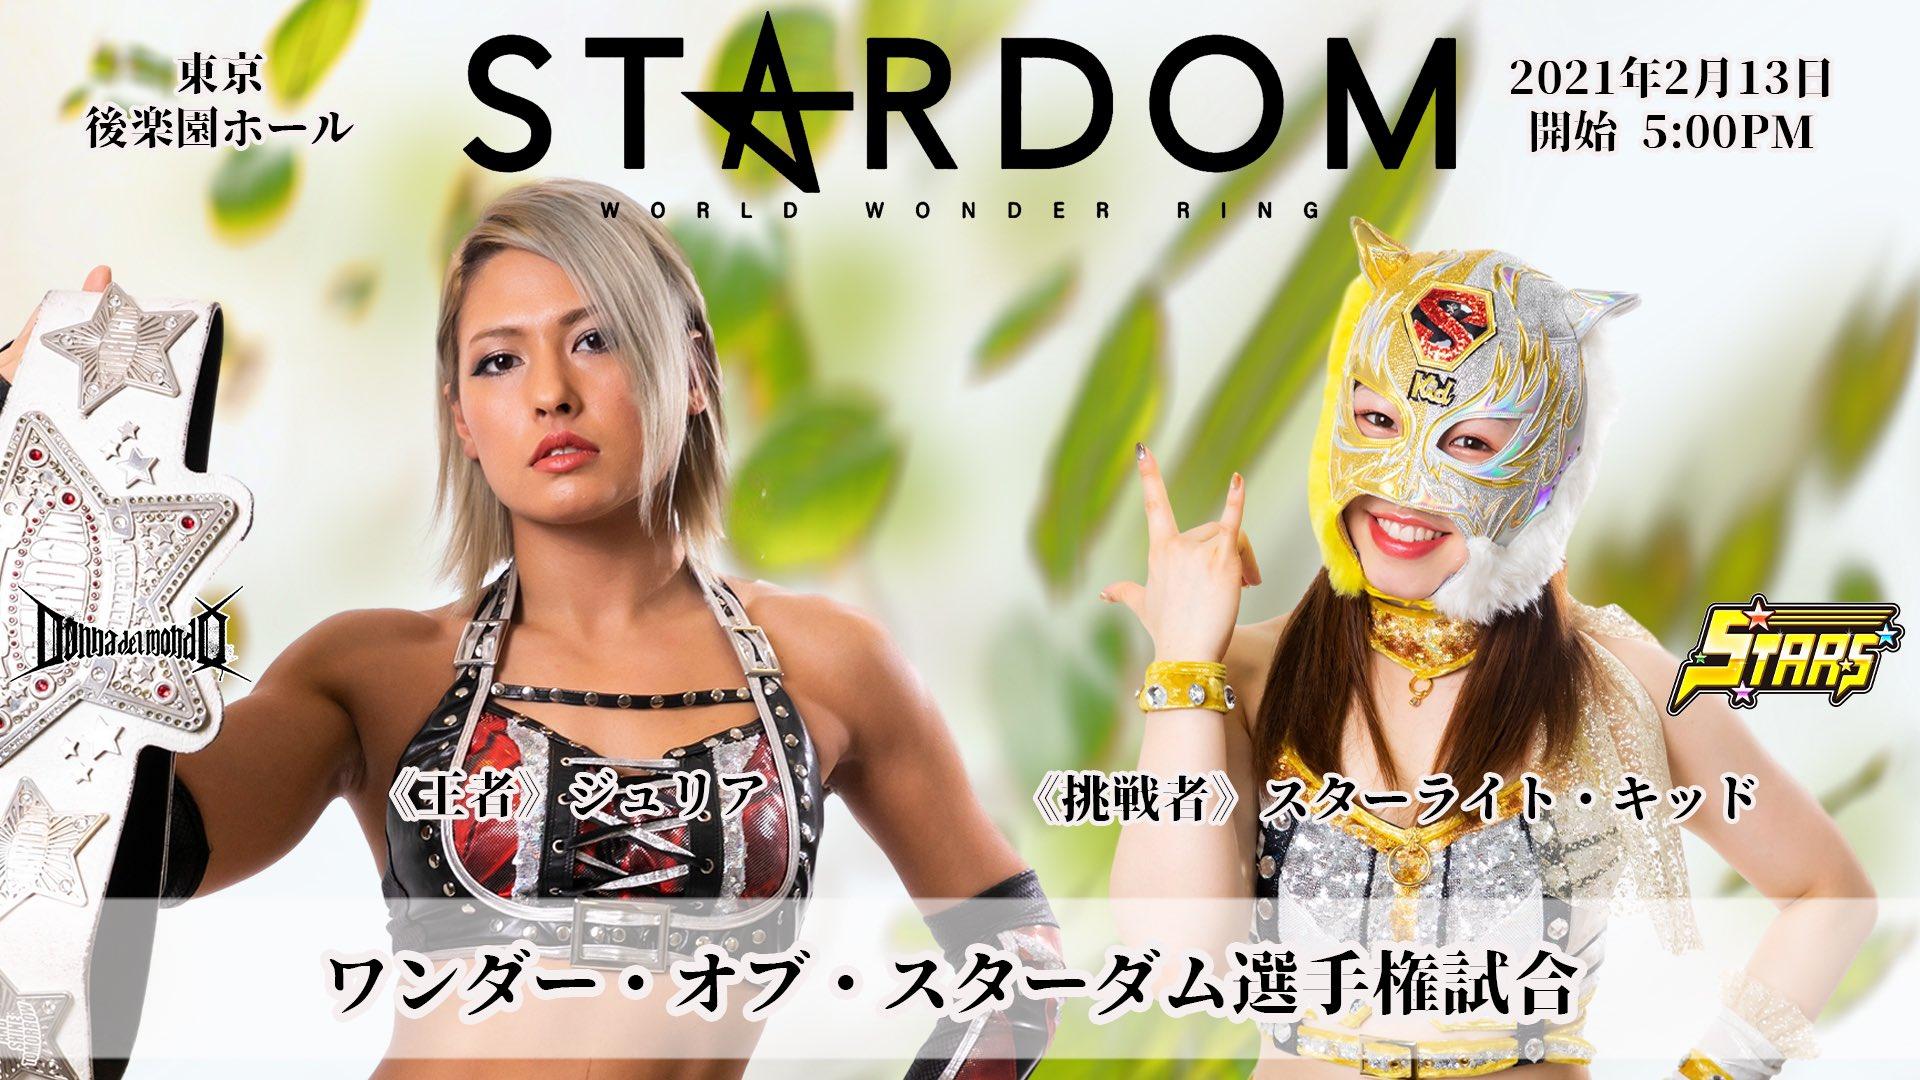 STARDOM Go To BUDOKAN! Results: Giulia Vs. Starlight Kid, Chigusa Nagayo Appears